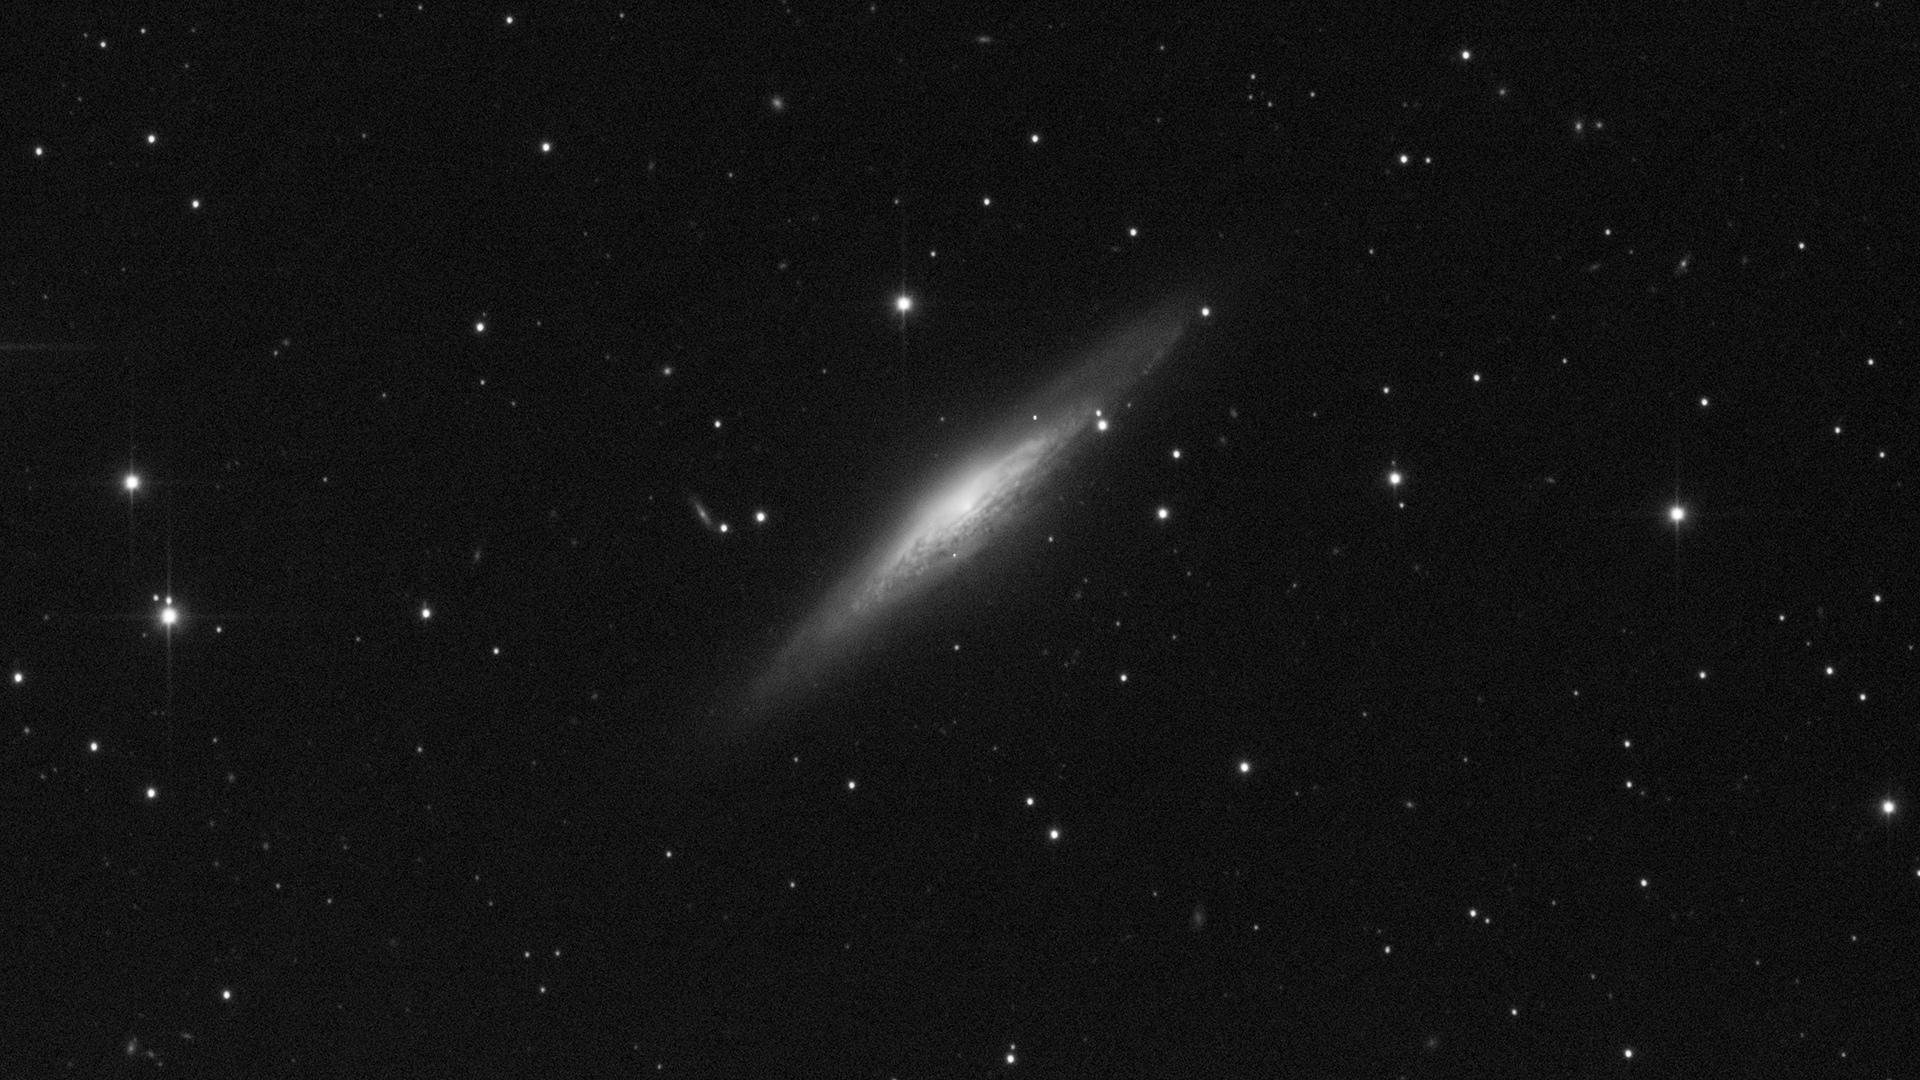 602f87346aa1d_r_pp_NGC2683_stacked(1).jpg.824043a7abcf313417e5144d12f4b642.jpg